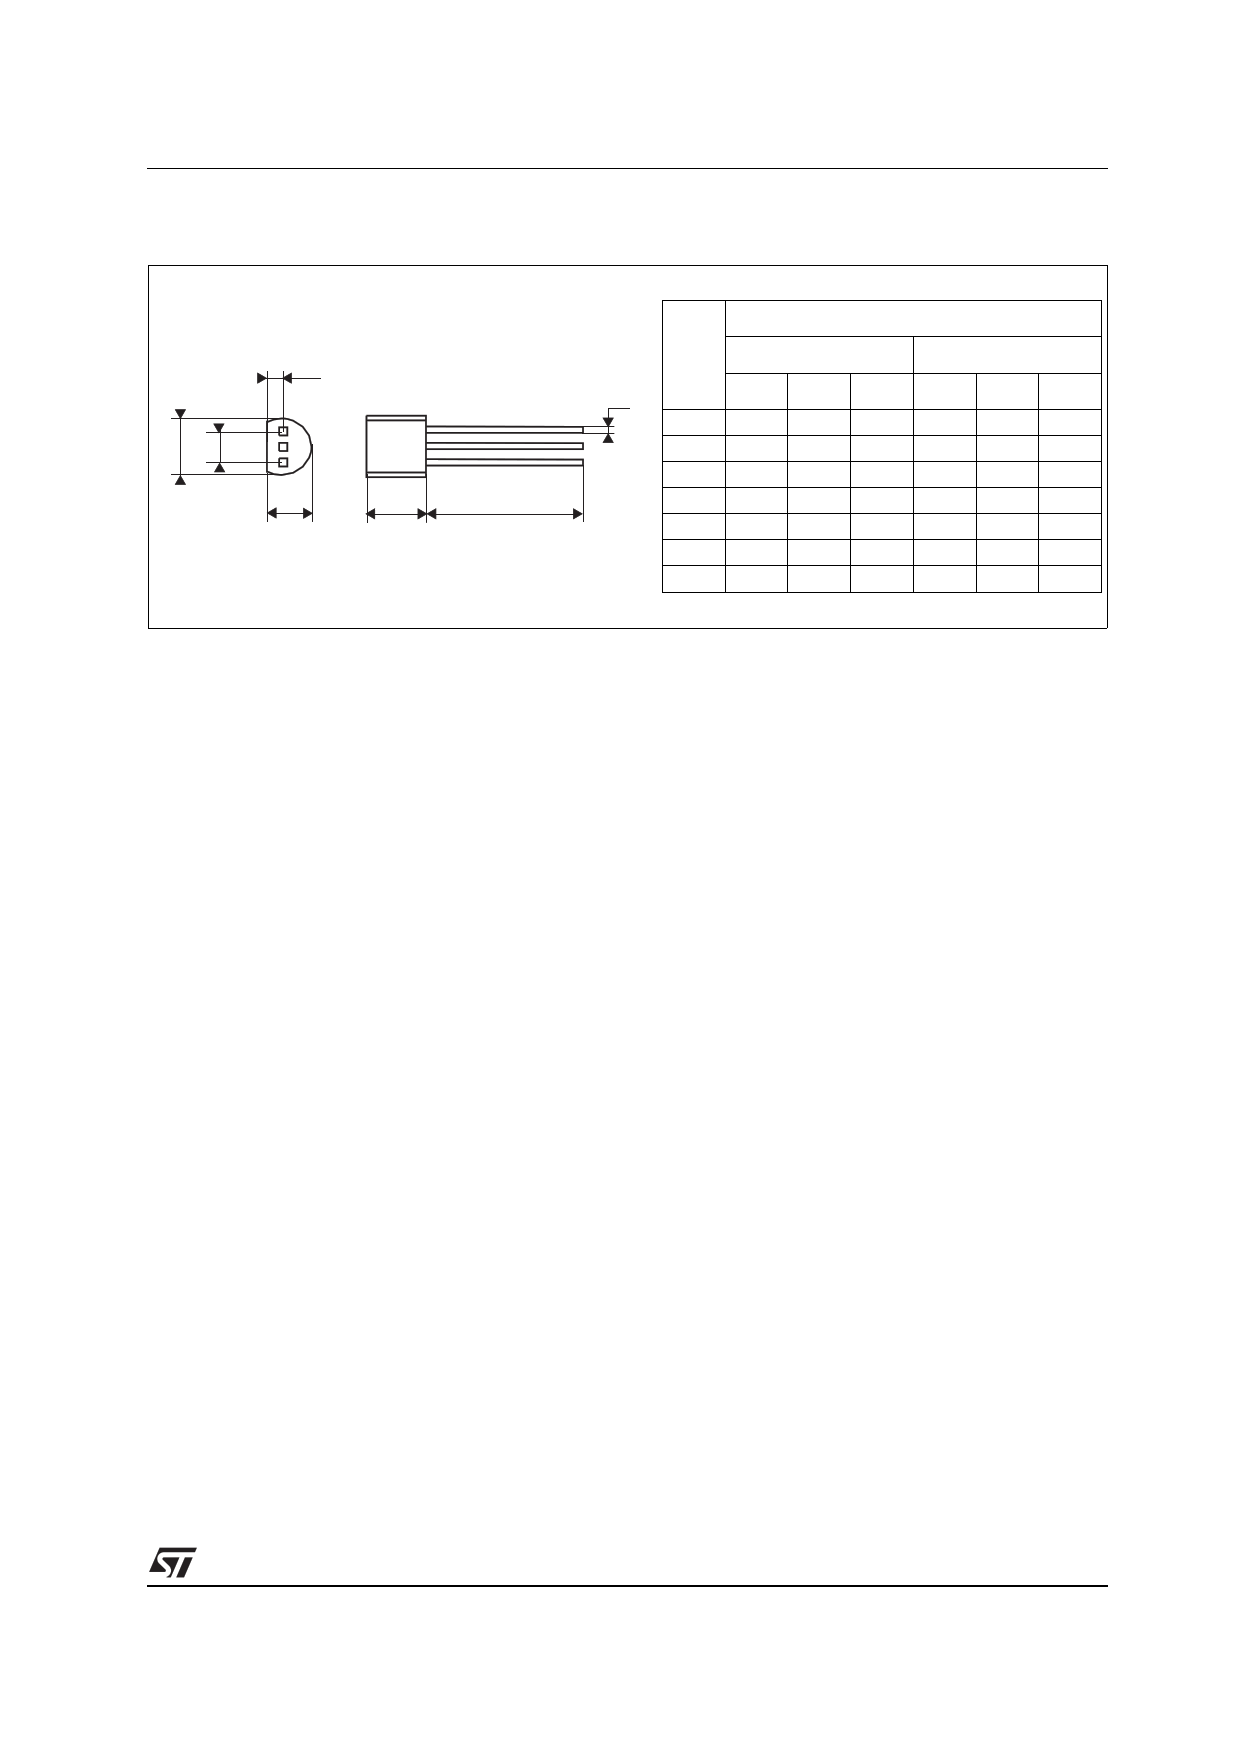 X00602MA2AL2 pdf, arduino